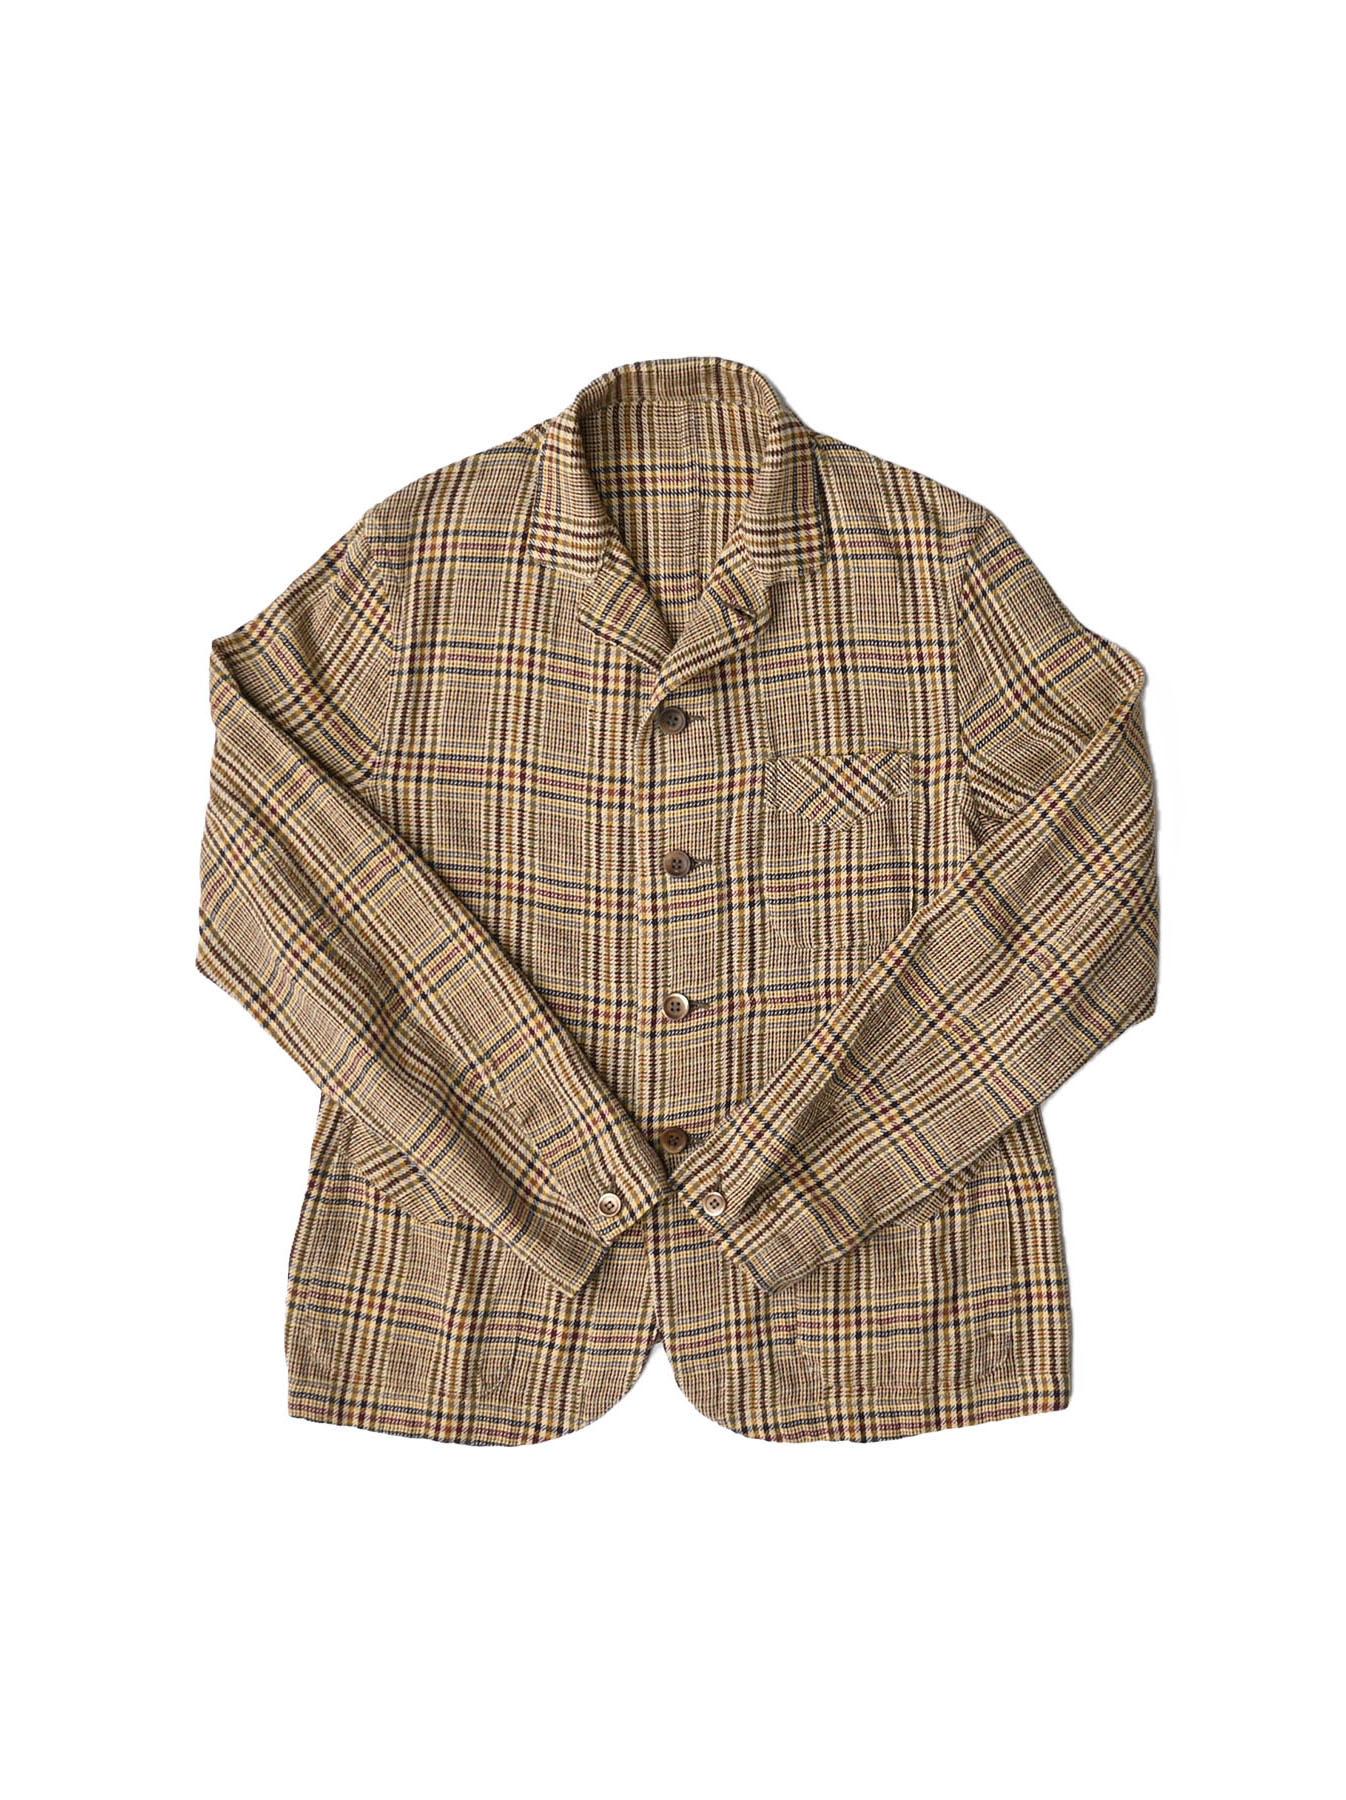 Indian Flannel Shirt-Jacket-1